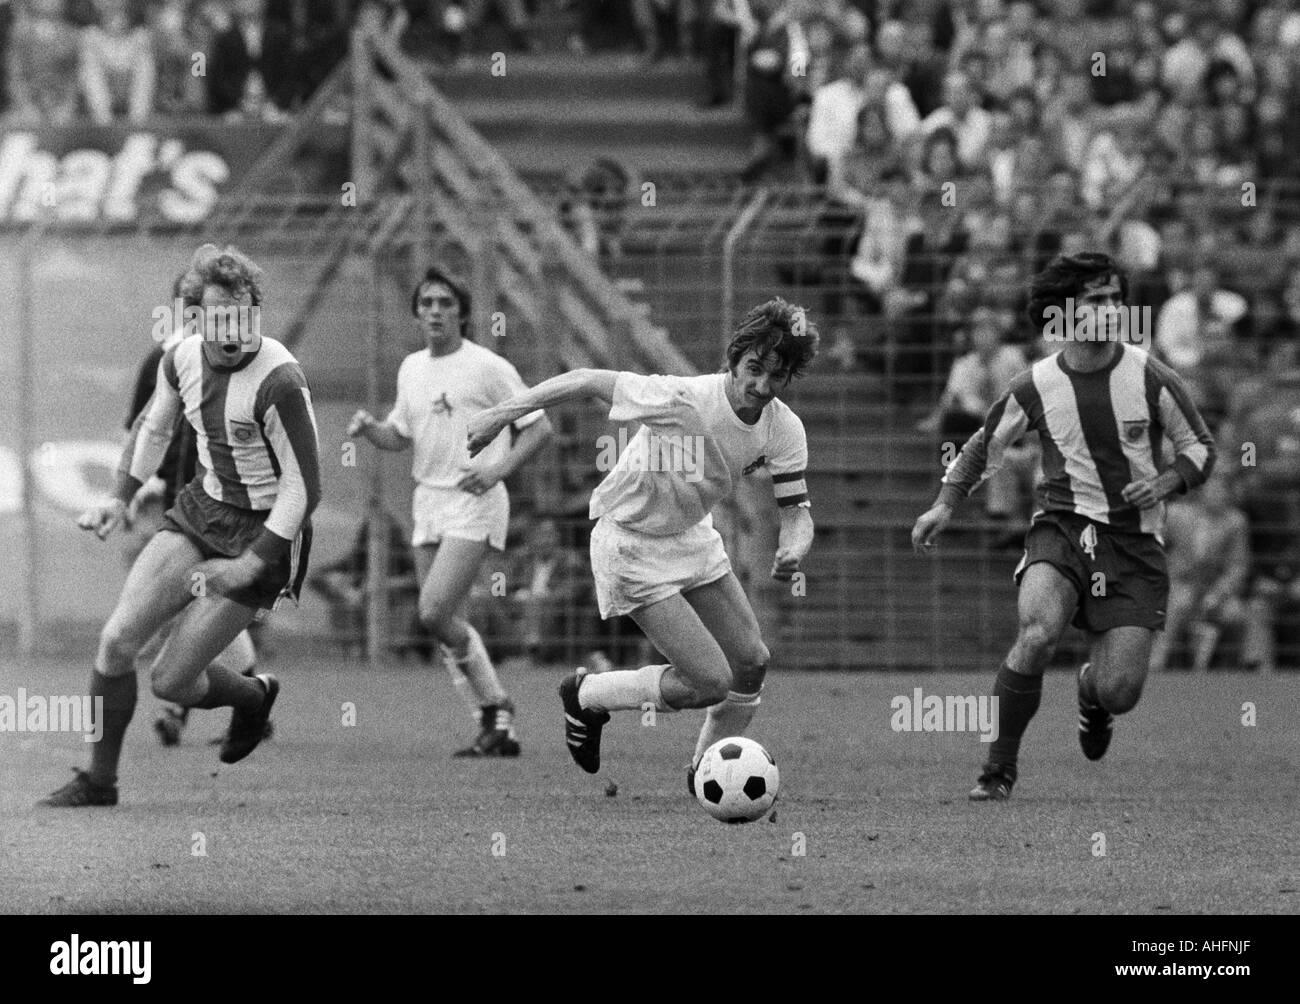 football, Bundesliga, 1971/1972, Stadium Radrennbahn near the Muengersdorfer Stadium in Cologne, 1. FC Cologne versus FC Bayern Munich 1:4, scene of the match, f.l.t.r. Johnny Hansen (FCB), Jupp Kapellmann (Koeln), Hennes Loehr (Koeln), Gerd Mueller (FCB) - Stock Image